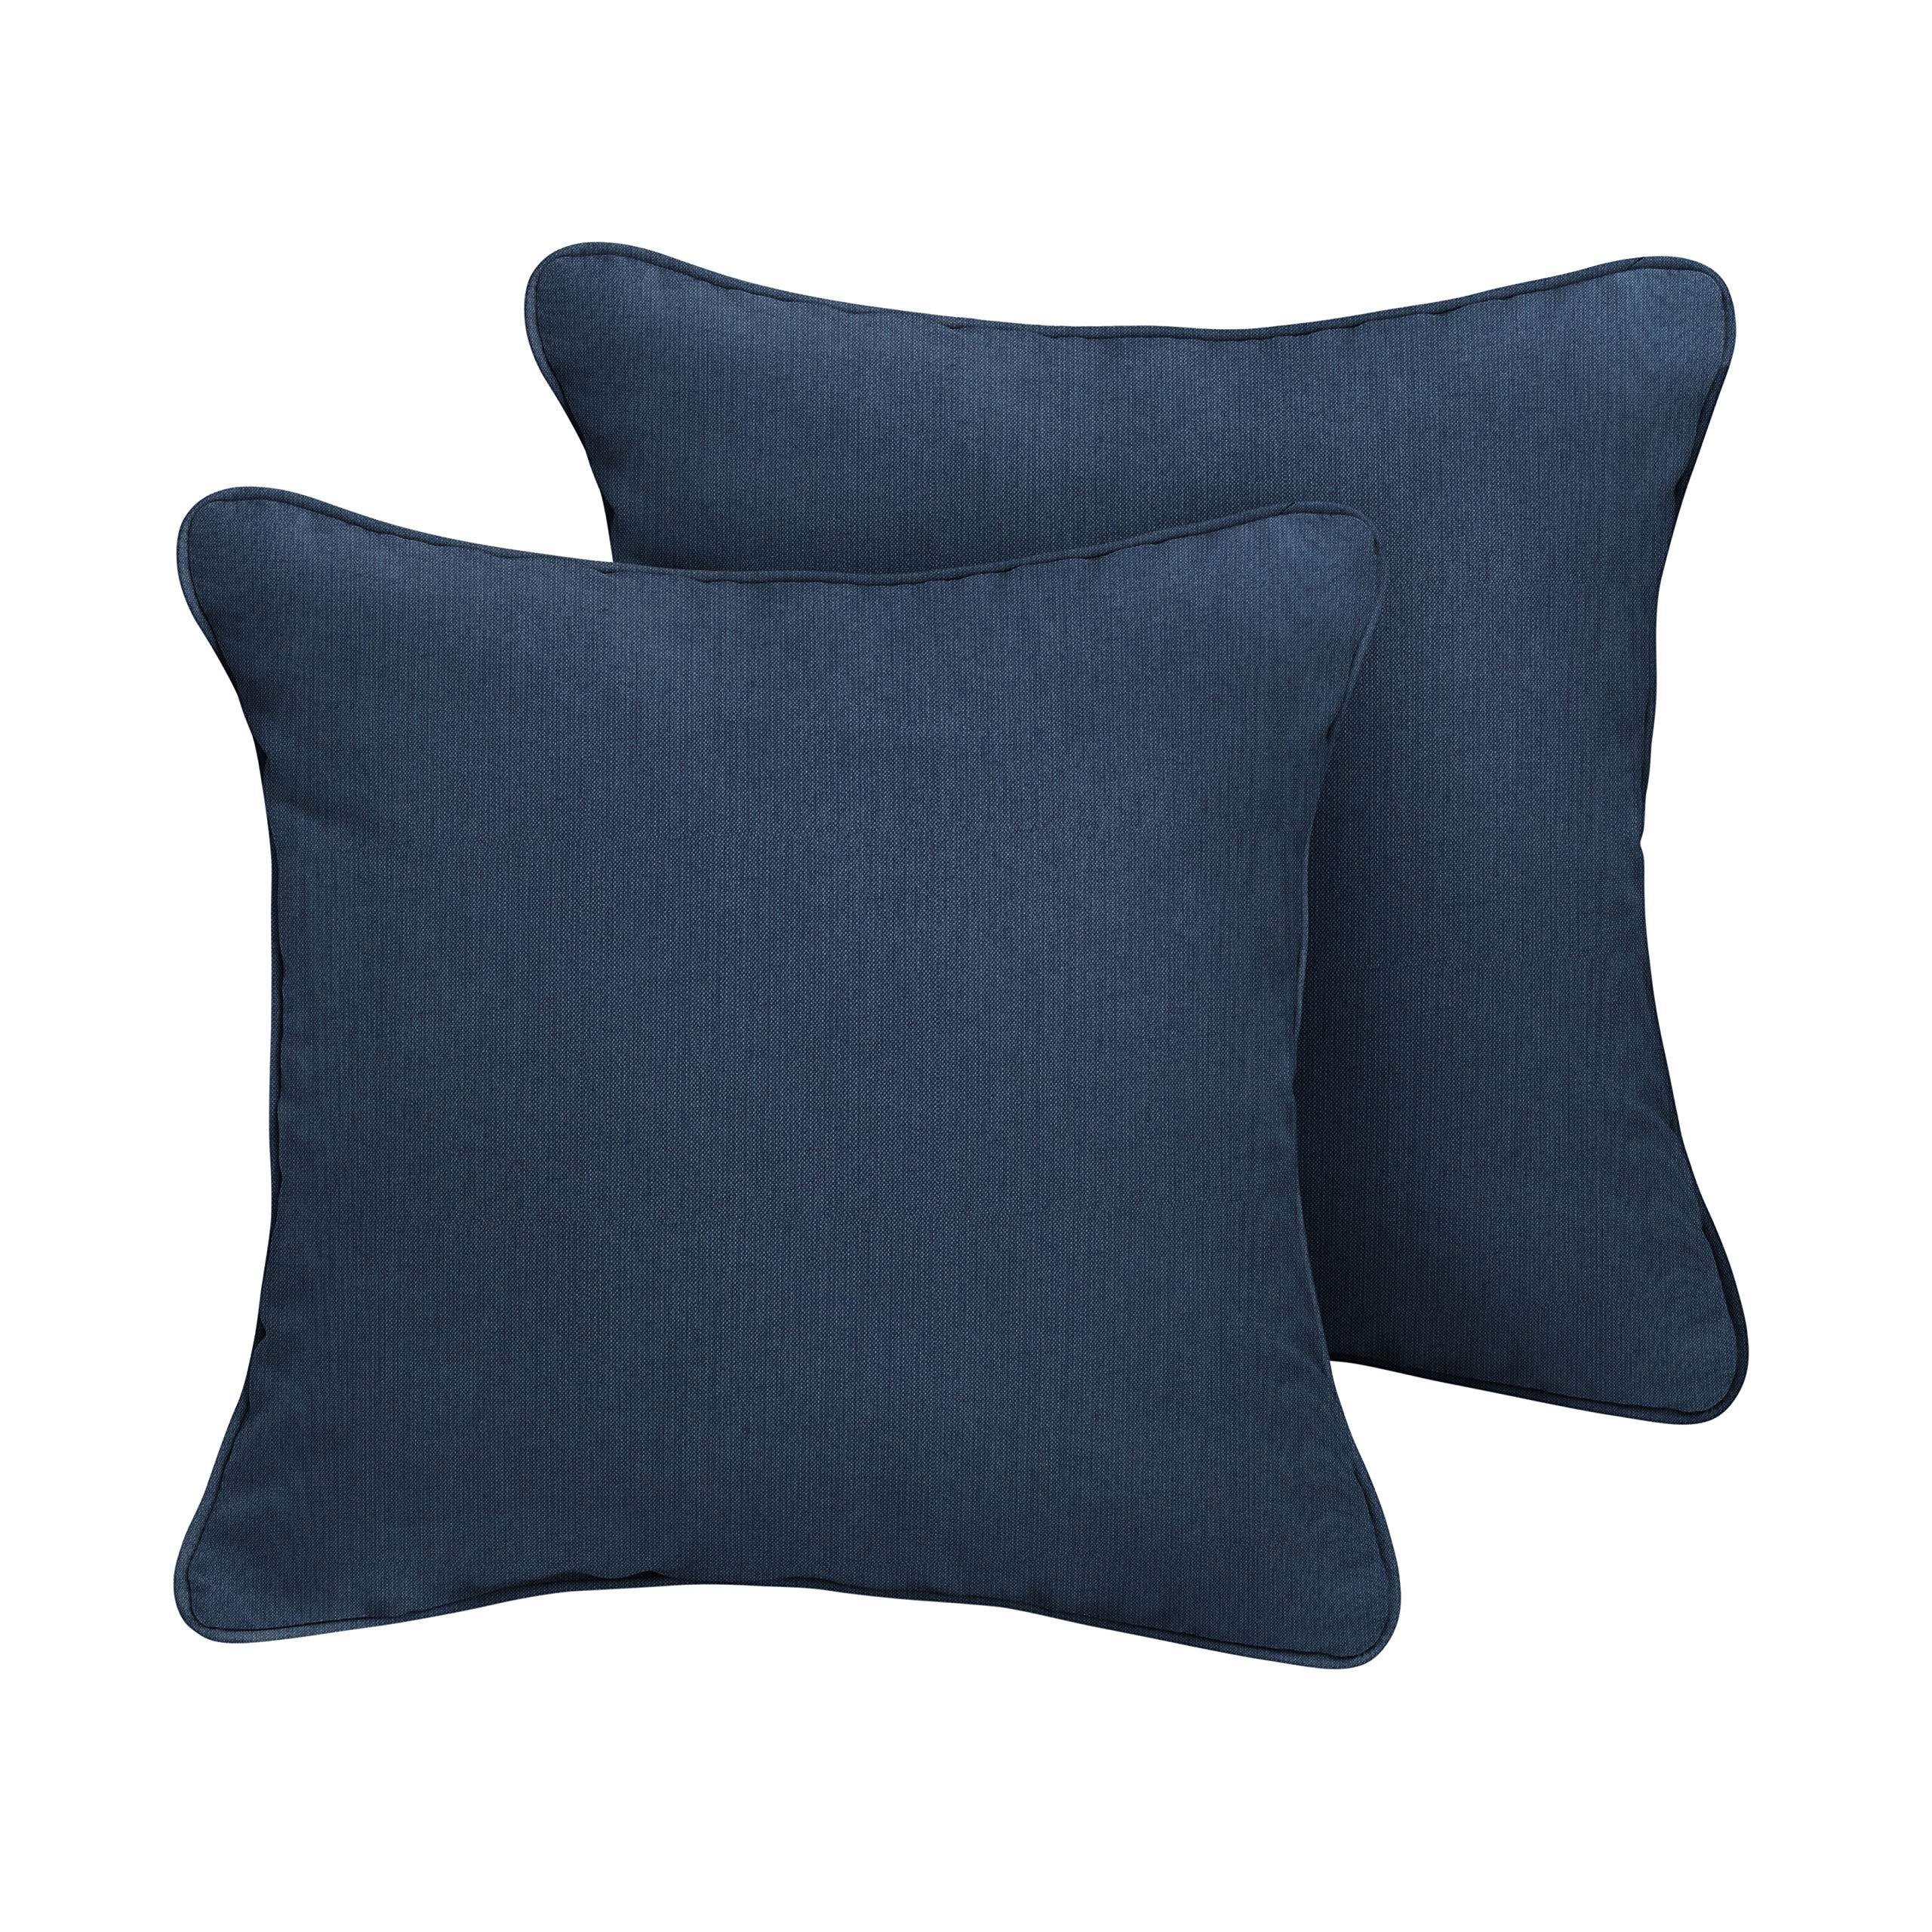 1101Design Sunbrella Spectrum Indigo Corded Decorative Indoor/Outdoor Square Throw Pillows, Perfect for Patio Décor - Indigo Blue 20'' (Set of 2)